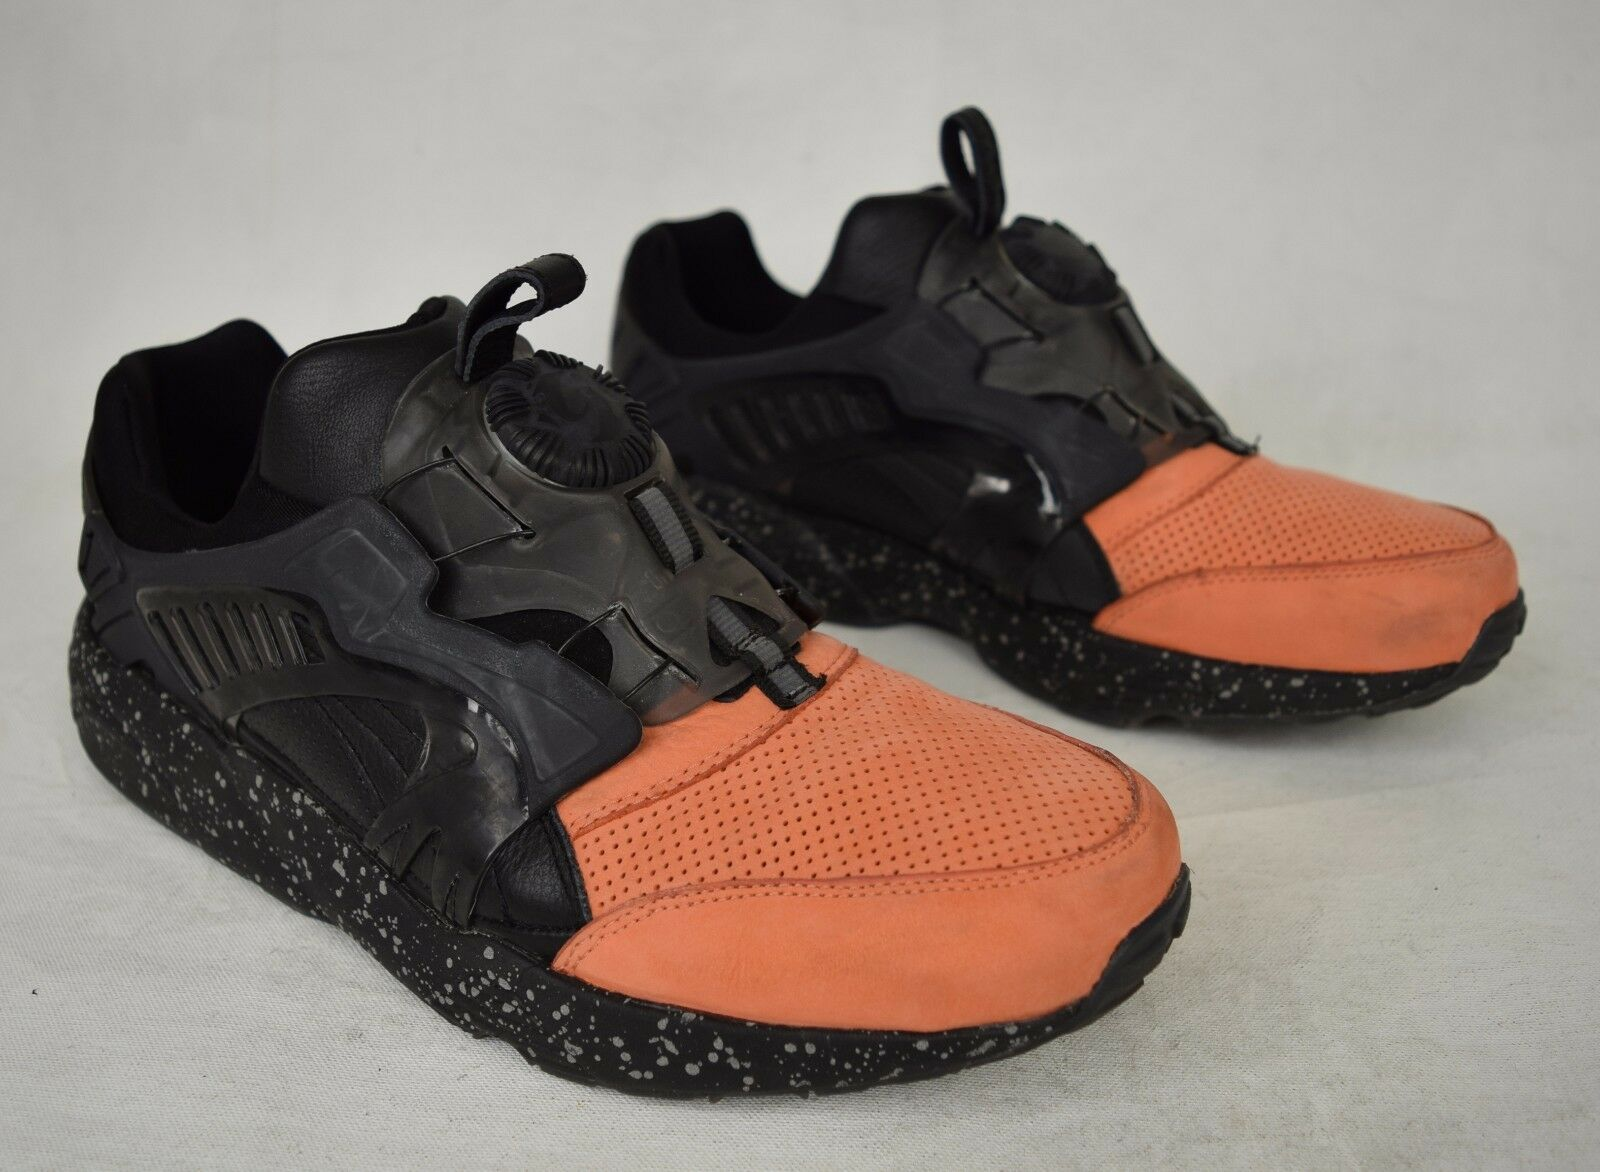 Puma RF Disc Blaze OG COA Black Salmon Ronnie Fieg Shoes 11 35660801 Mens 01 best-selling model of the brand